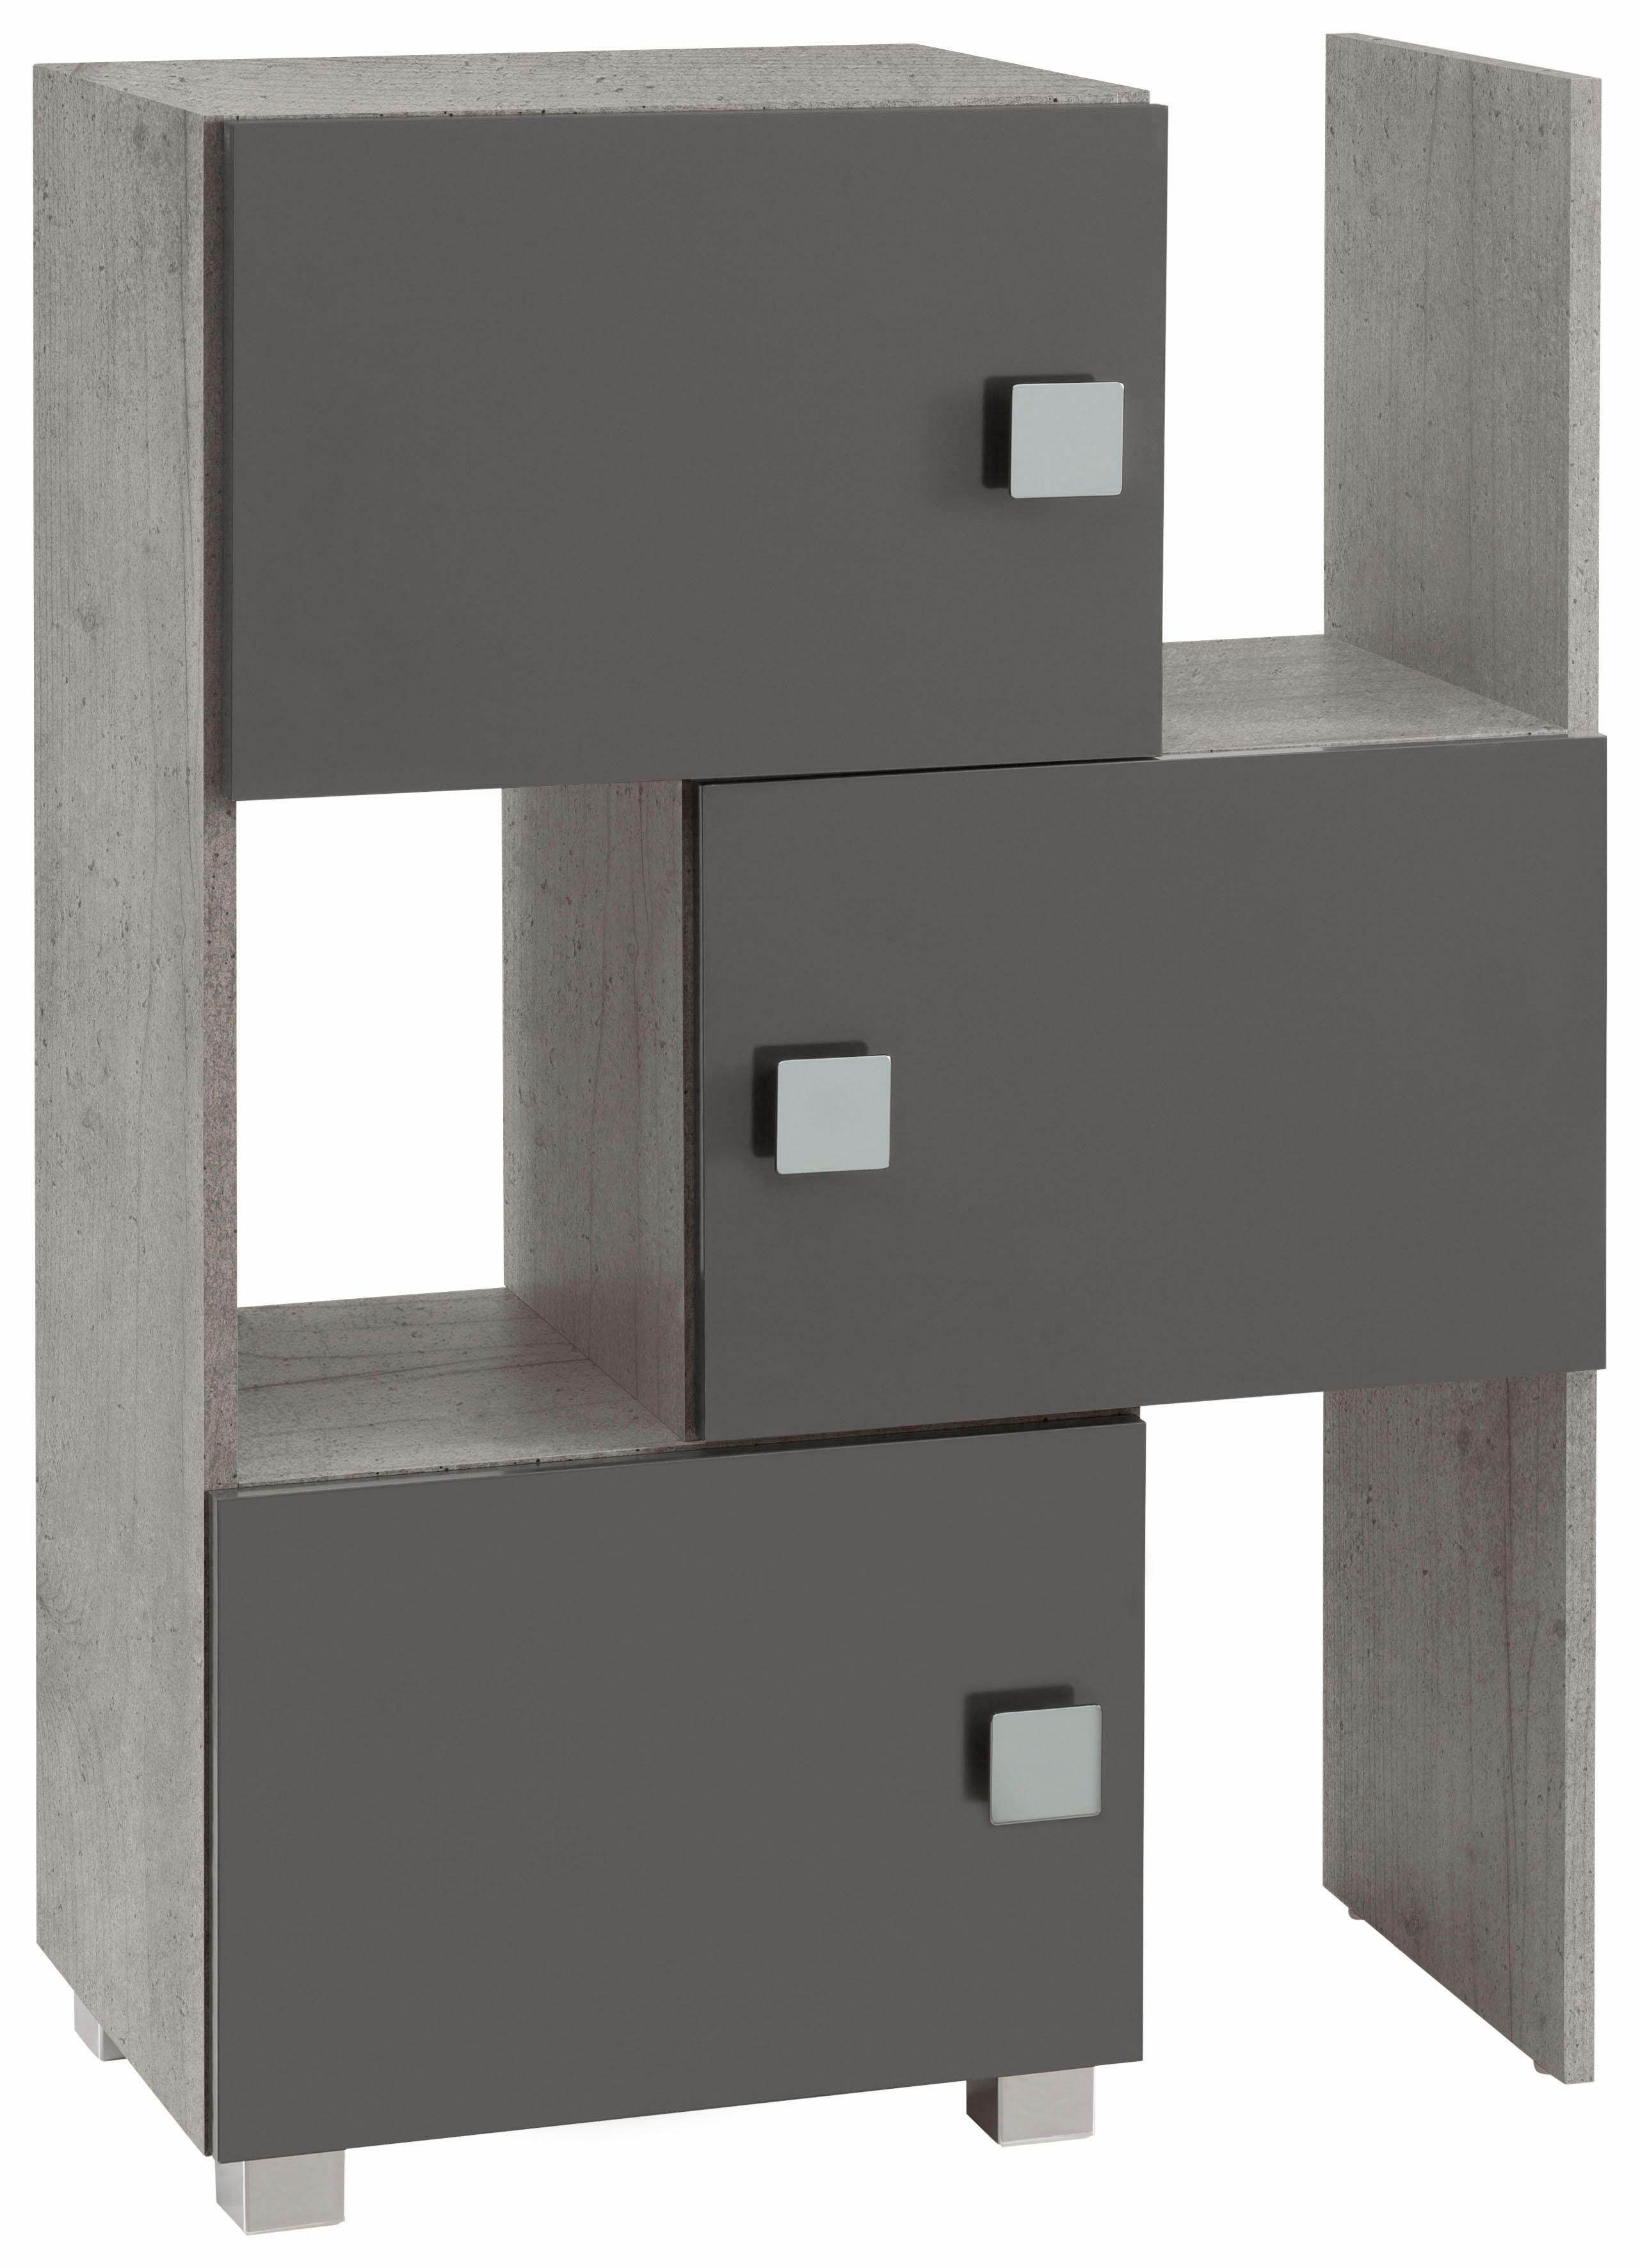 Schildmeyer Schieberegal Quadra | Büro > Büroregale > Standregale | Schildmeyer